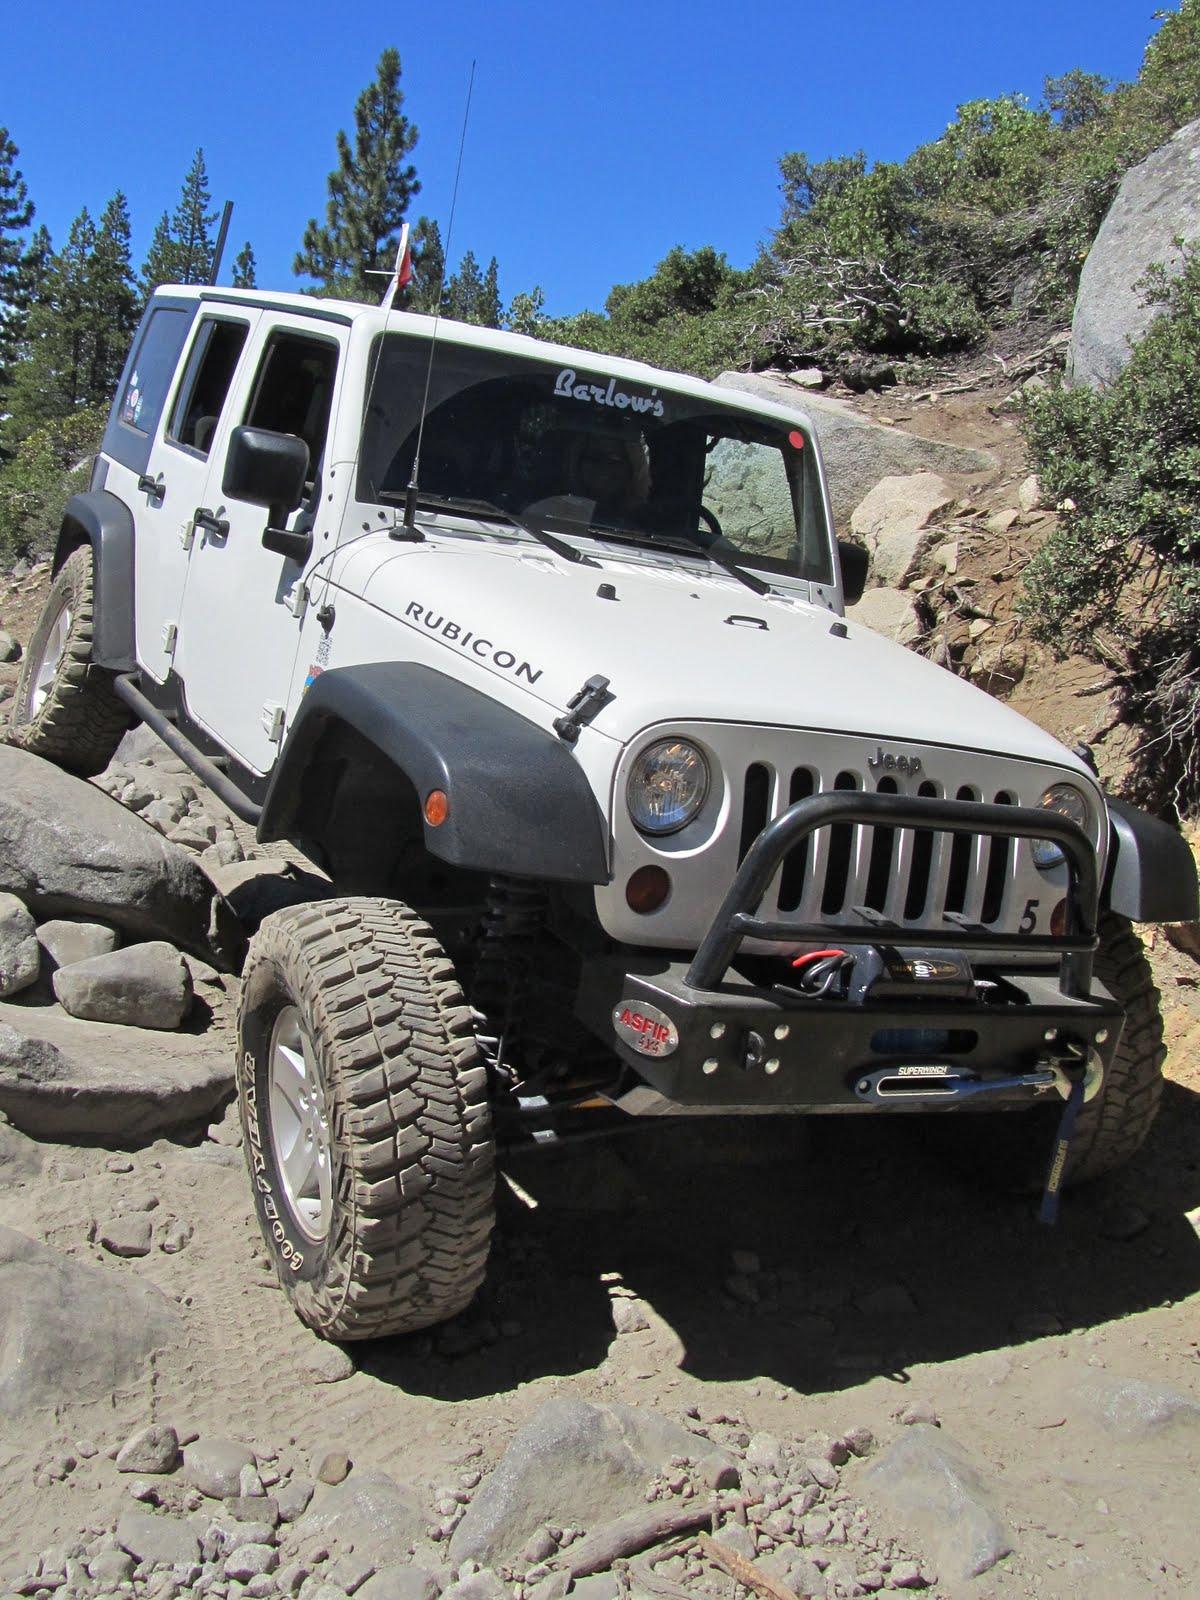 Barlow Jeeps For Sale 2009 Jeep Wrangler Built